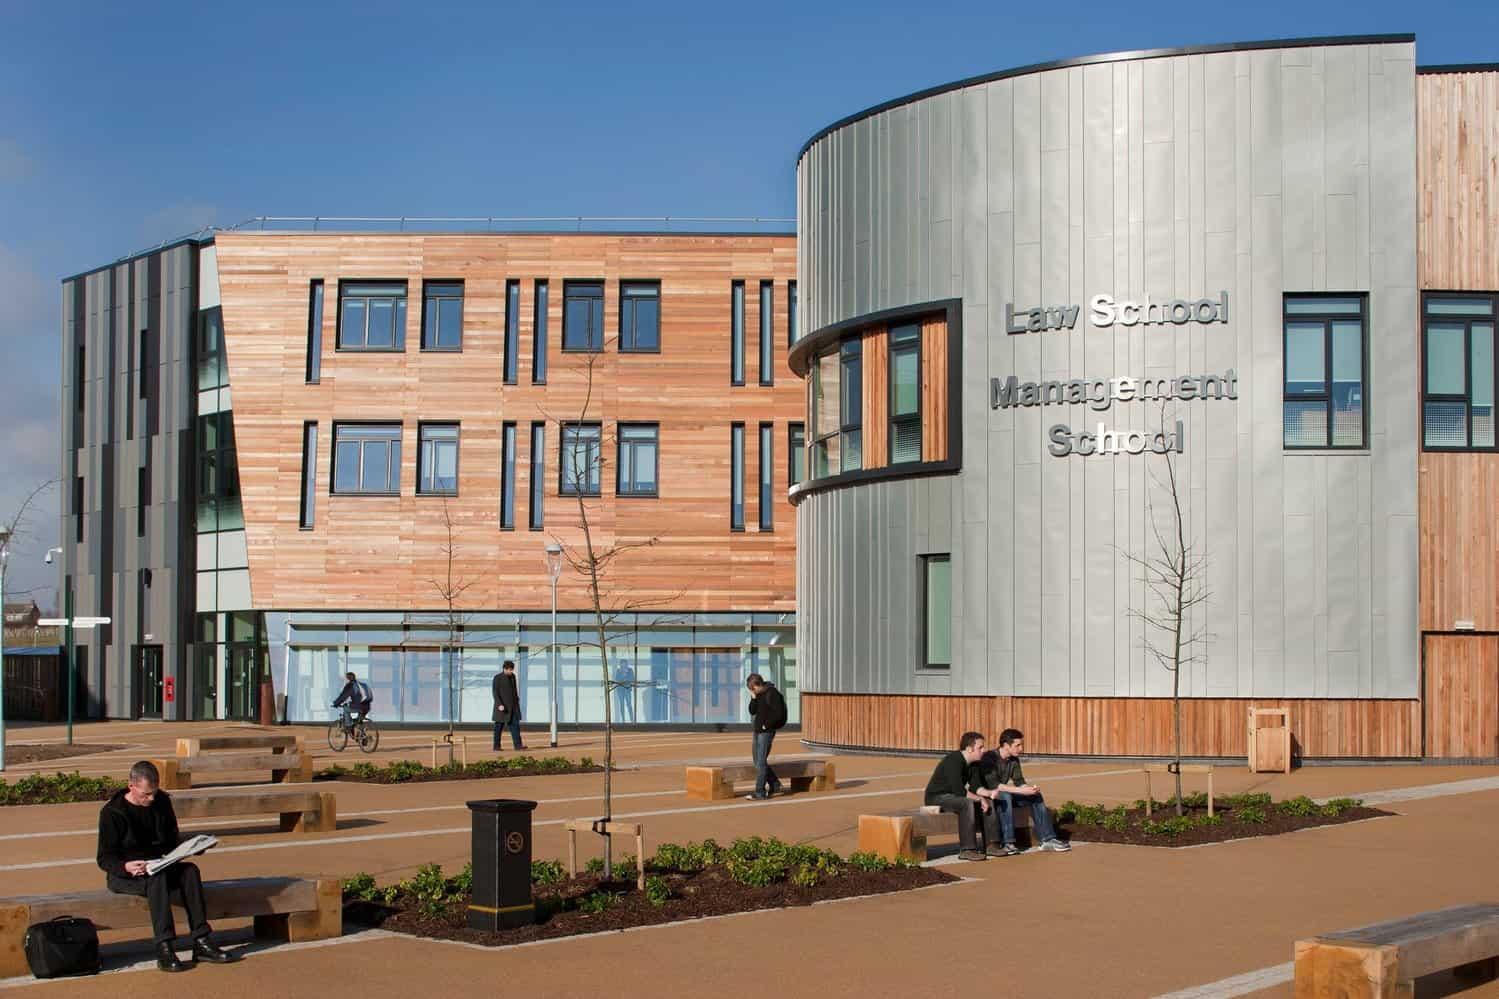 The York Management School Campus